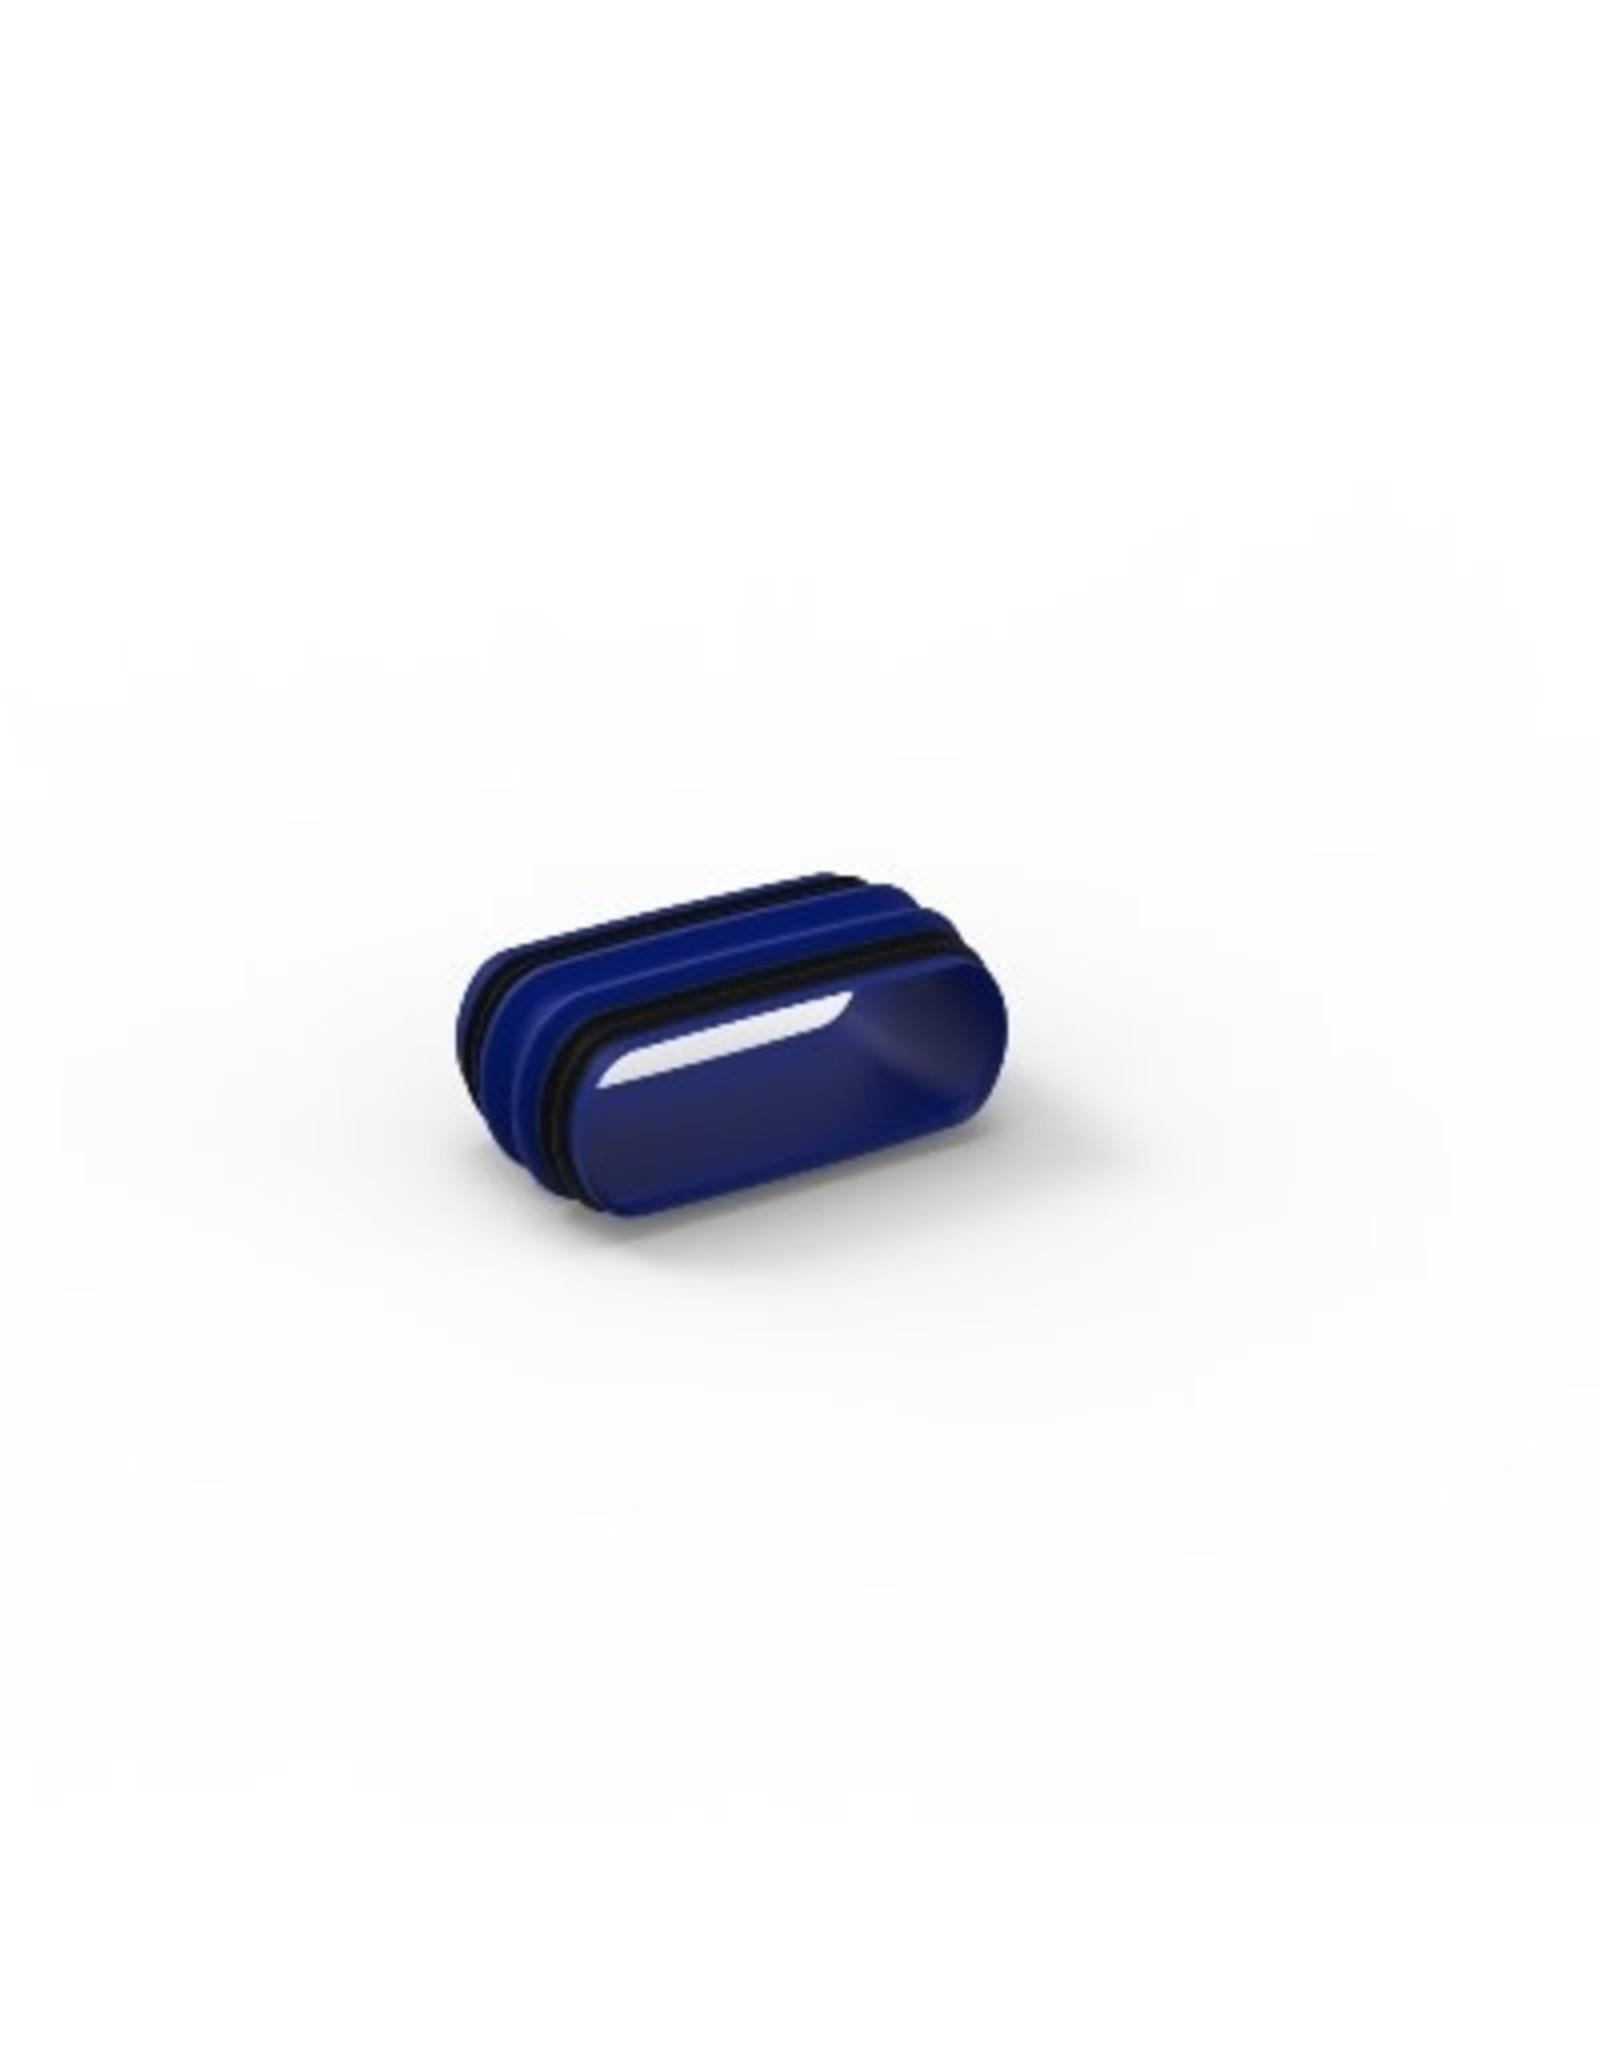 renson EASYFLEX koppelstuk - met rubbers - plat ovaal